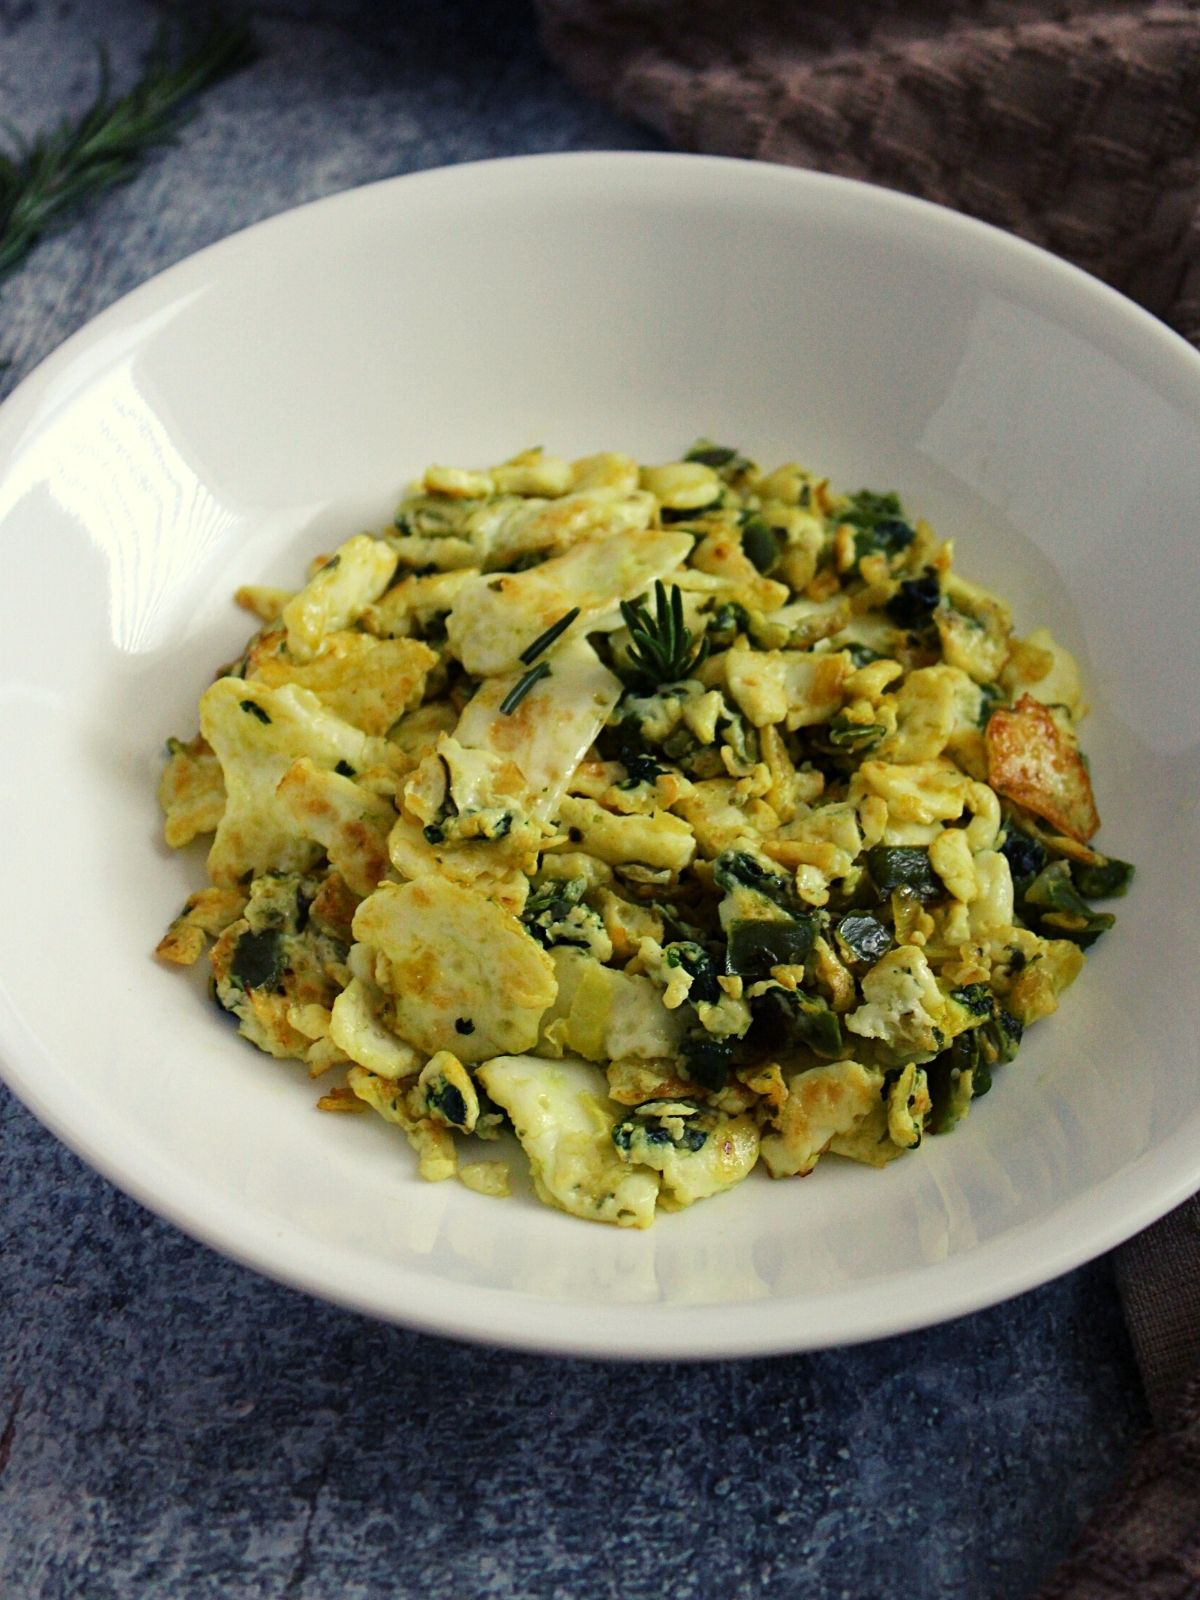 scrambled egg whites in a bowl